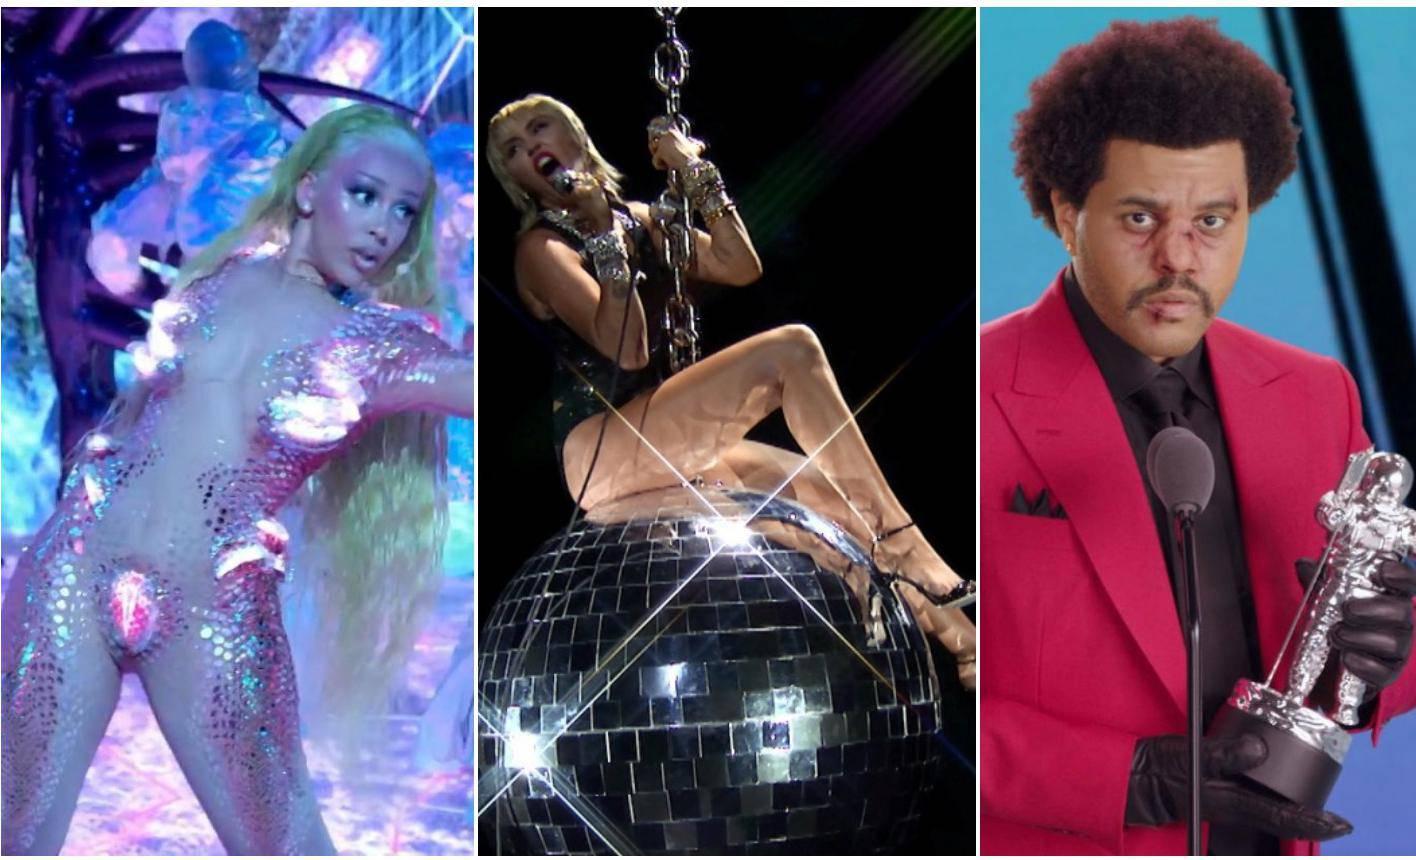 Miley opet zajahala kuglu, The Weeknd došao u modricama